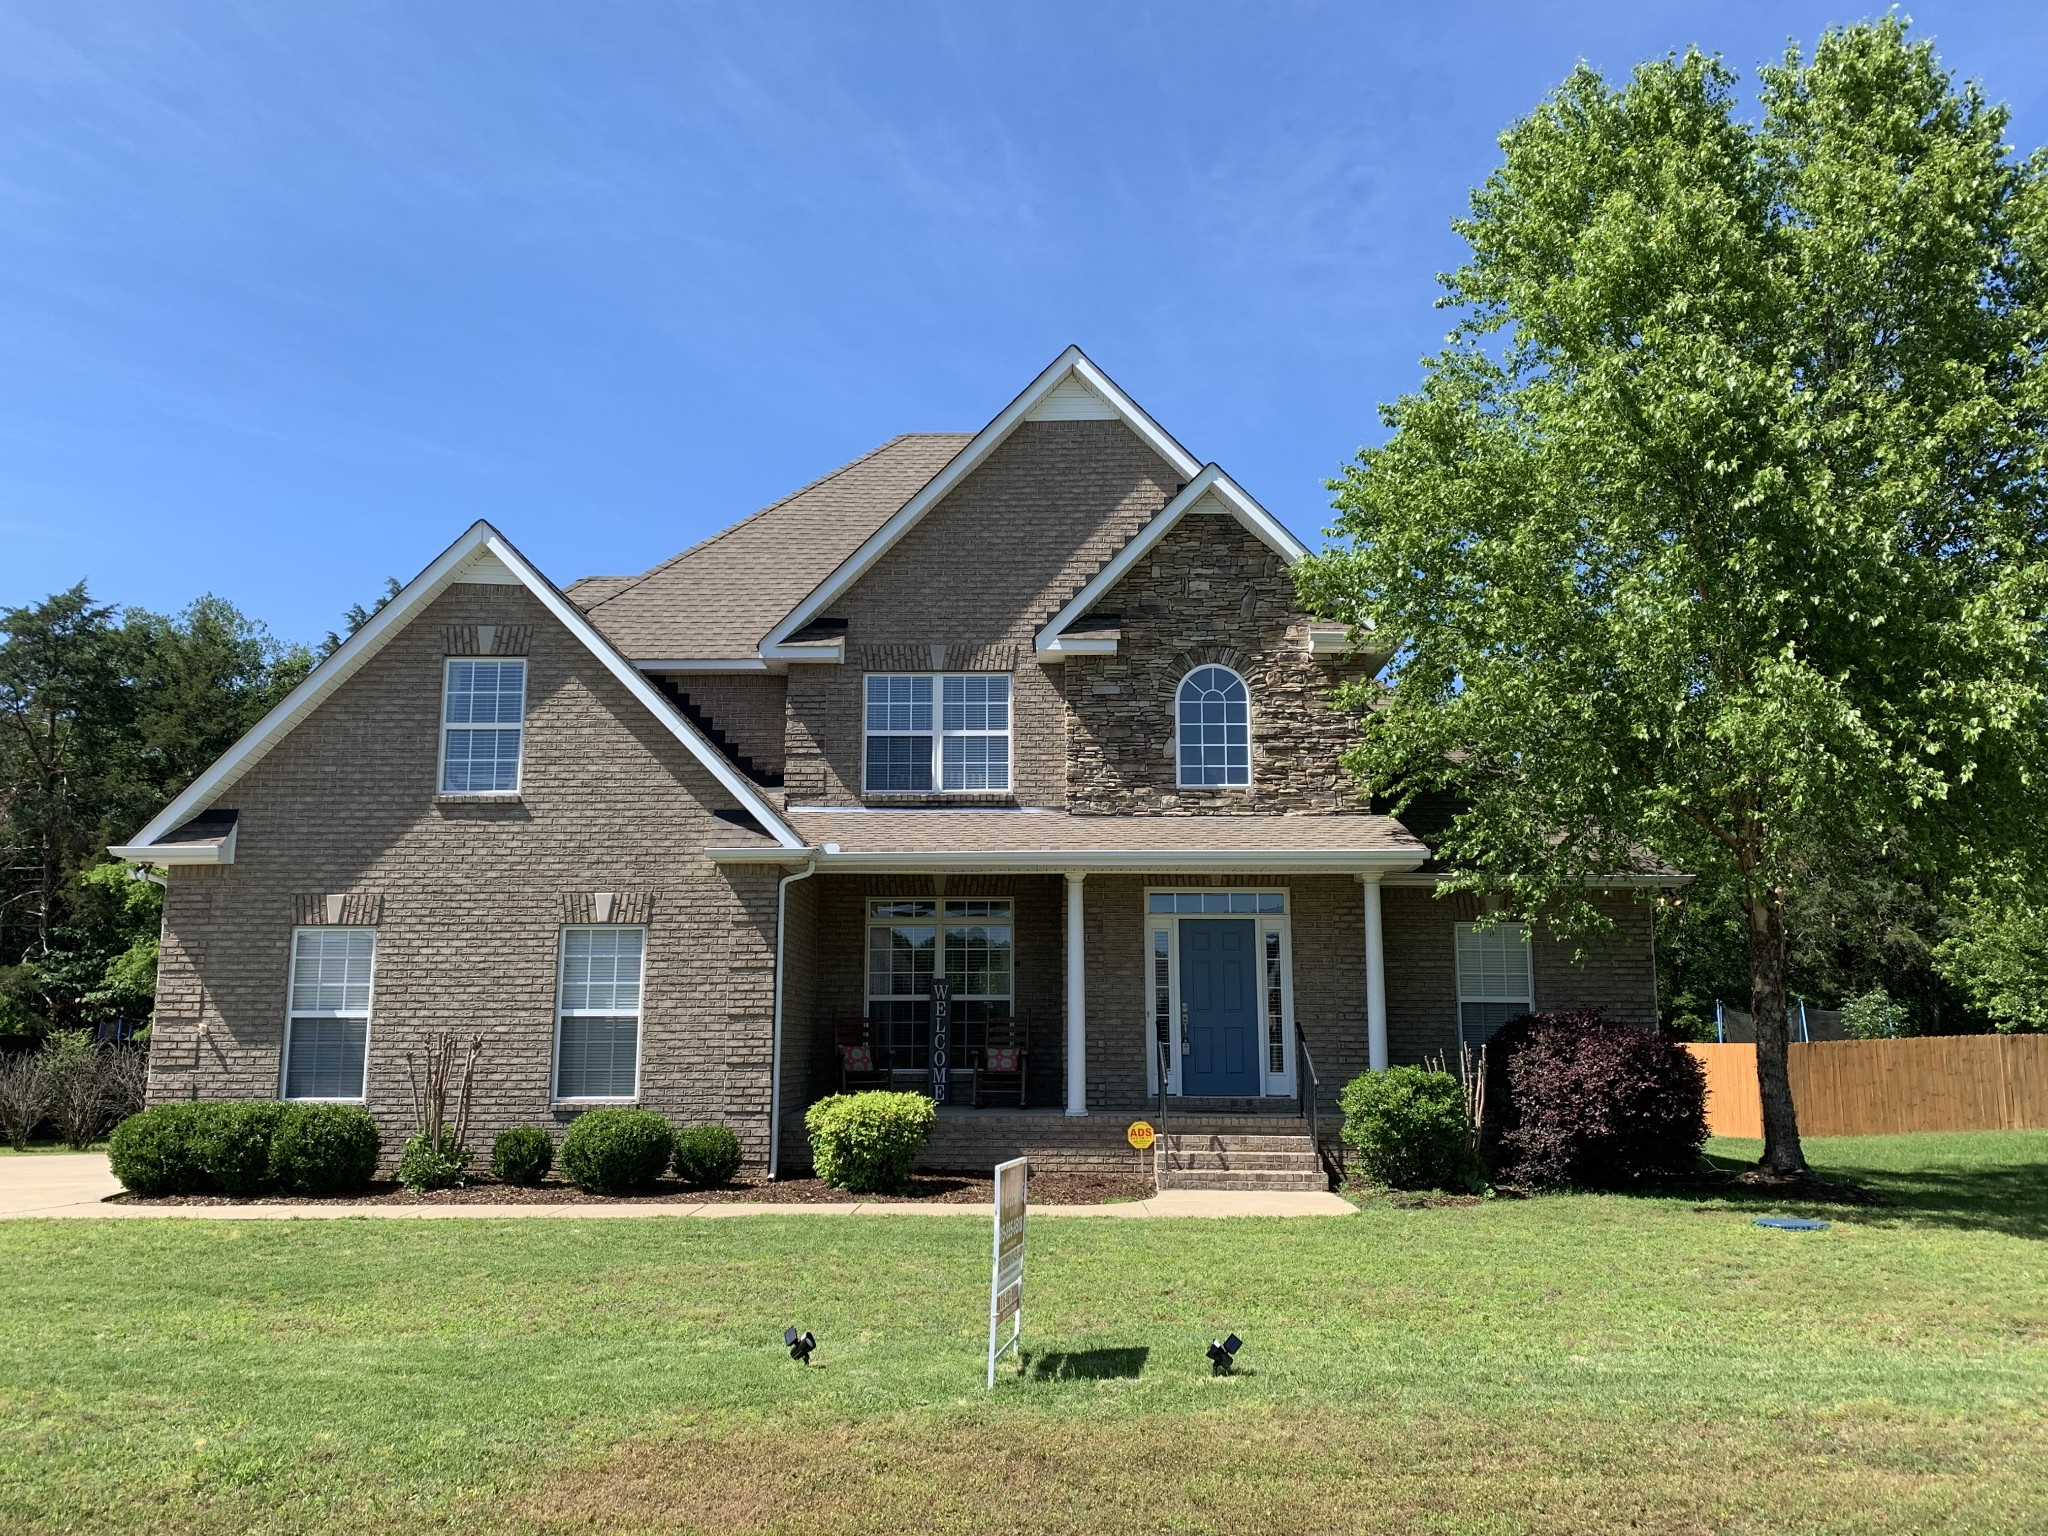 4321 Whirlaway DR Property Photo - Murfreesboro, TN real estate listing